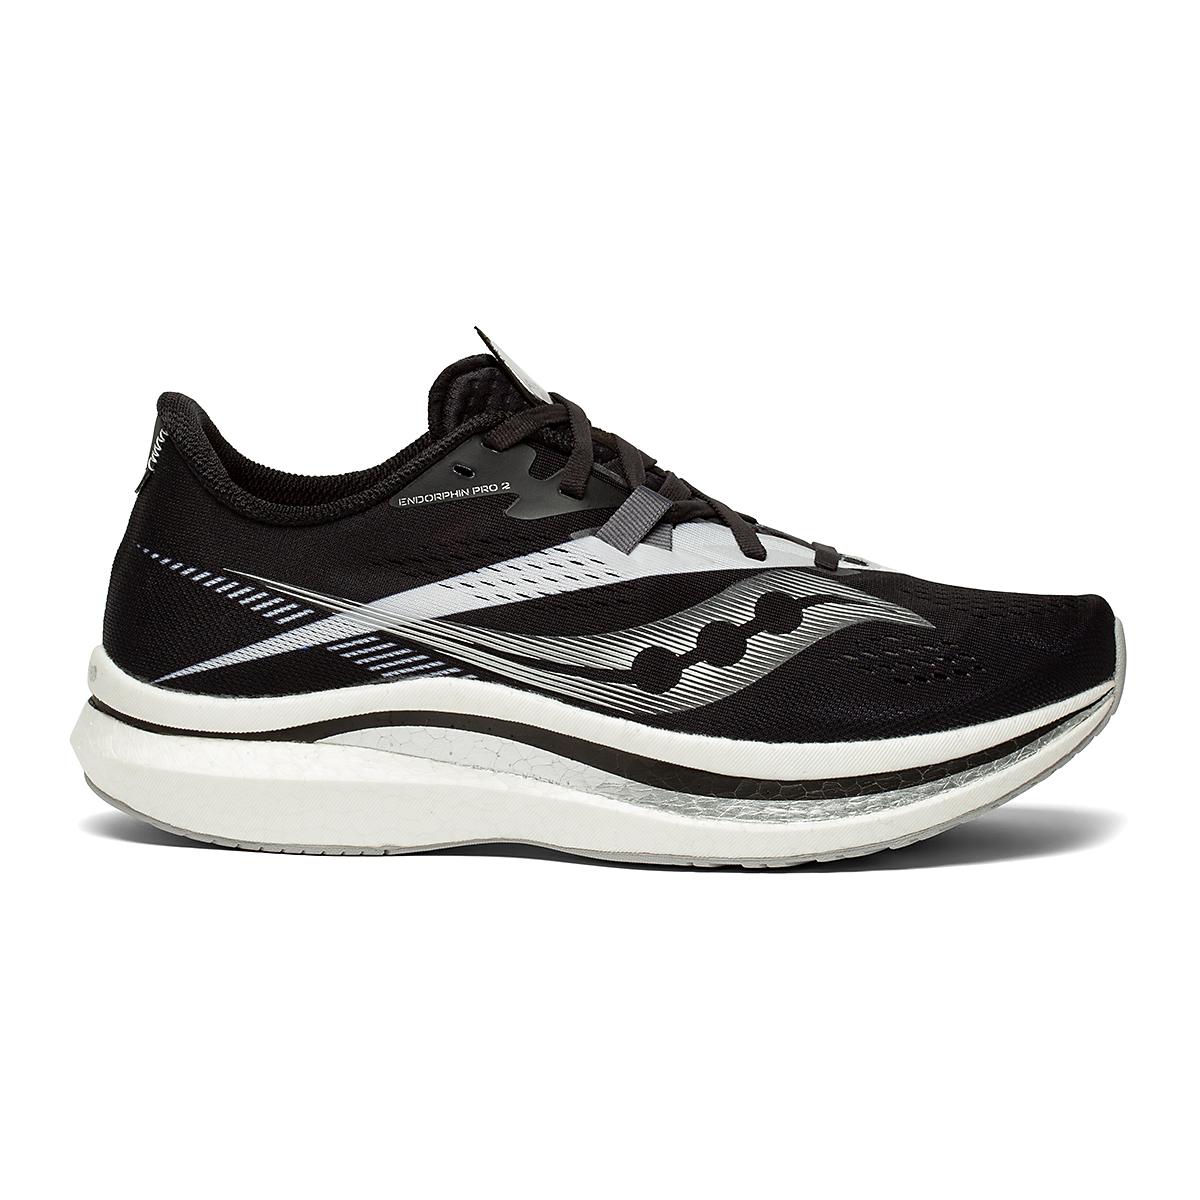 Men's Saucony Endorphin Pro 2 Running Shoe - Color: Black/White - Size: 7 - Width: Regular, Black/White, large, image 1